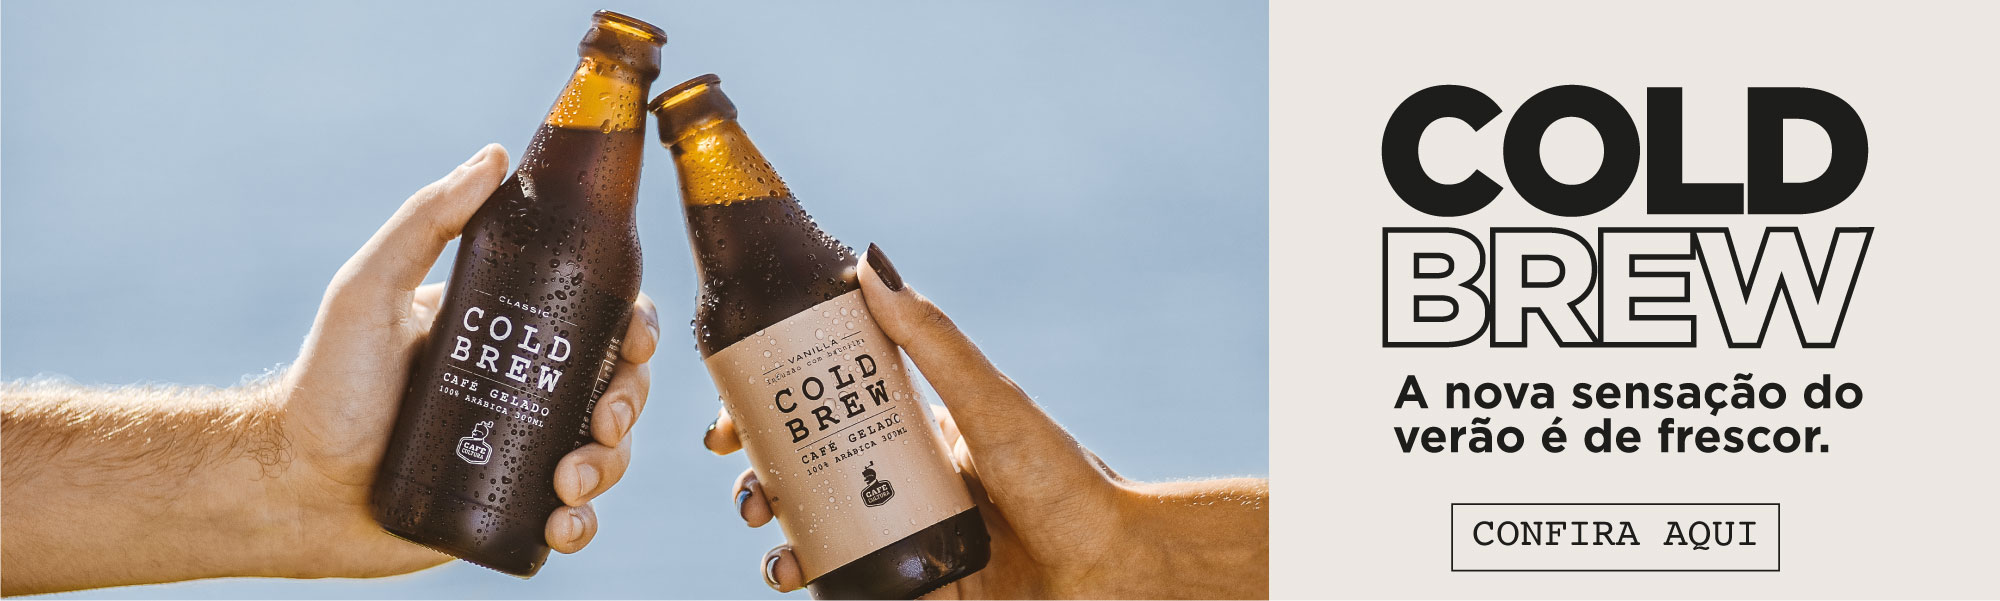 Cold brew Café Cultura